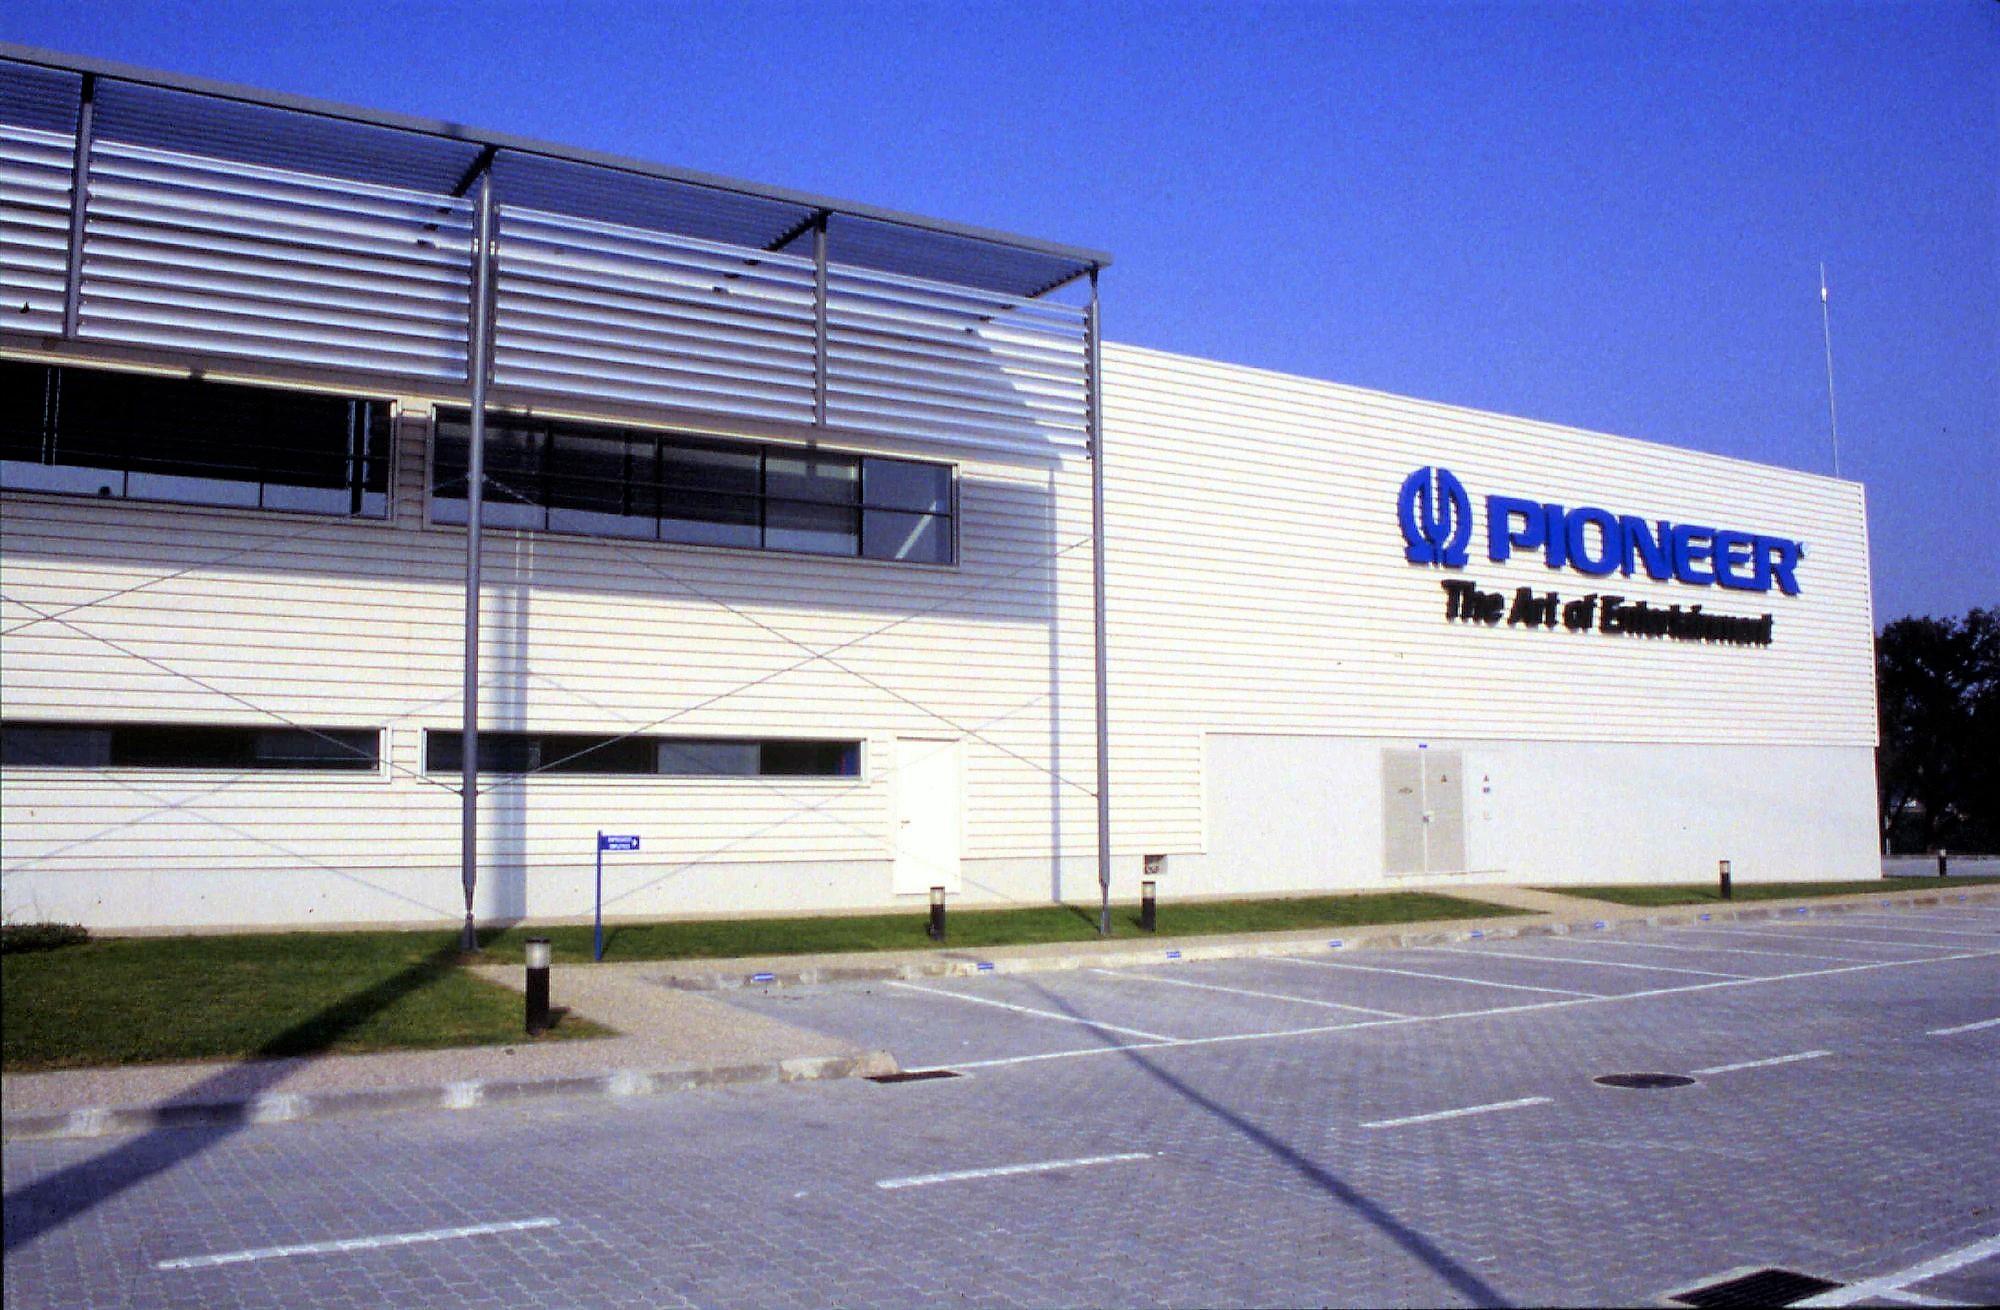 PIONEER AUTORADIO PLANT